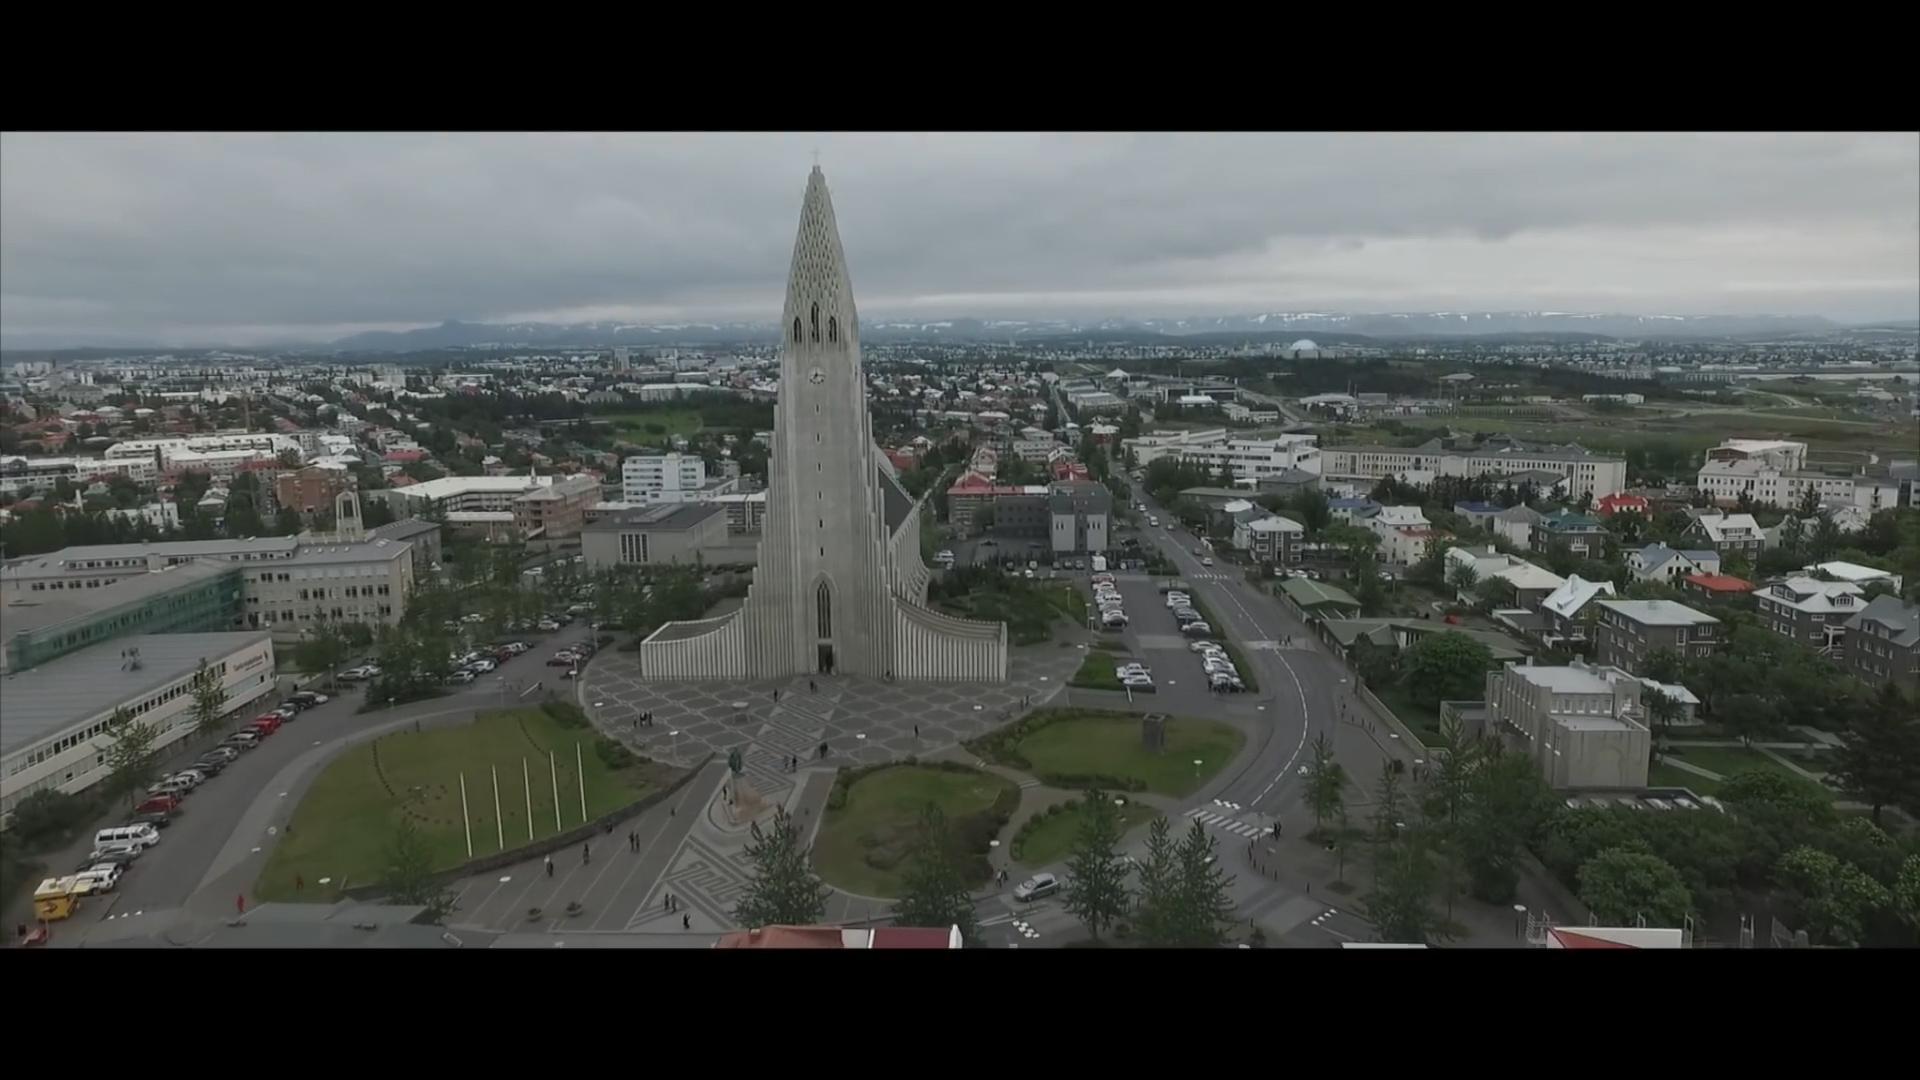 jim-west-central-church-iceland-aerial-4